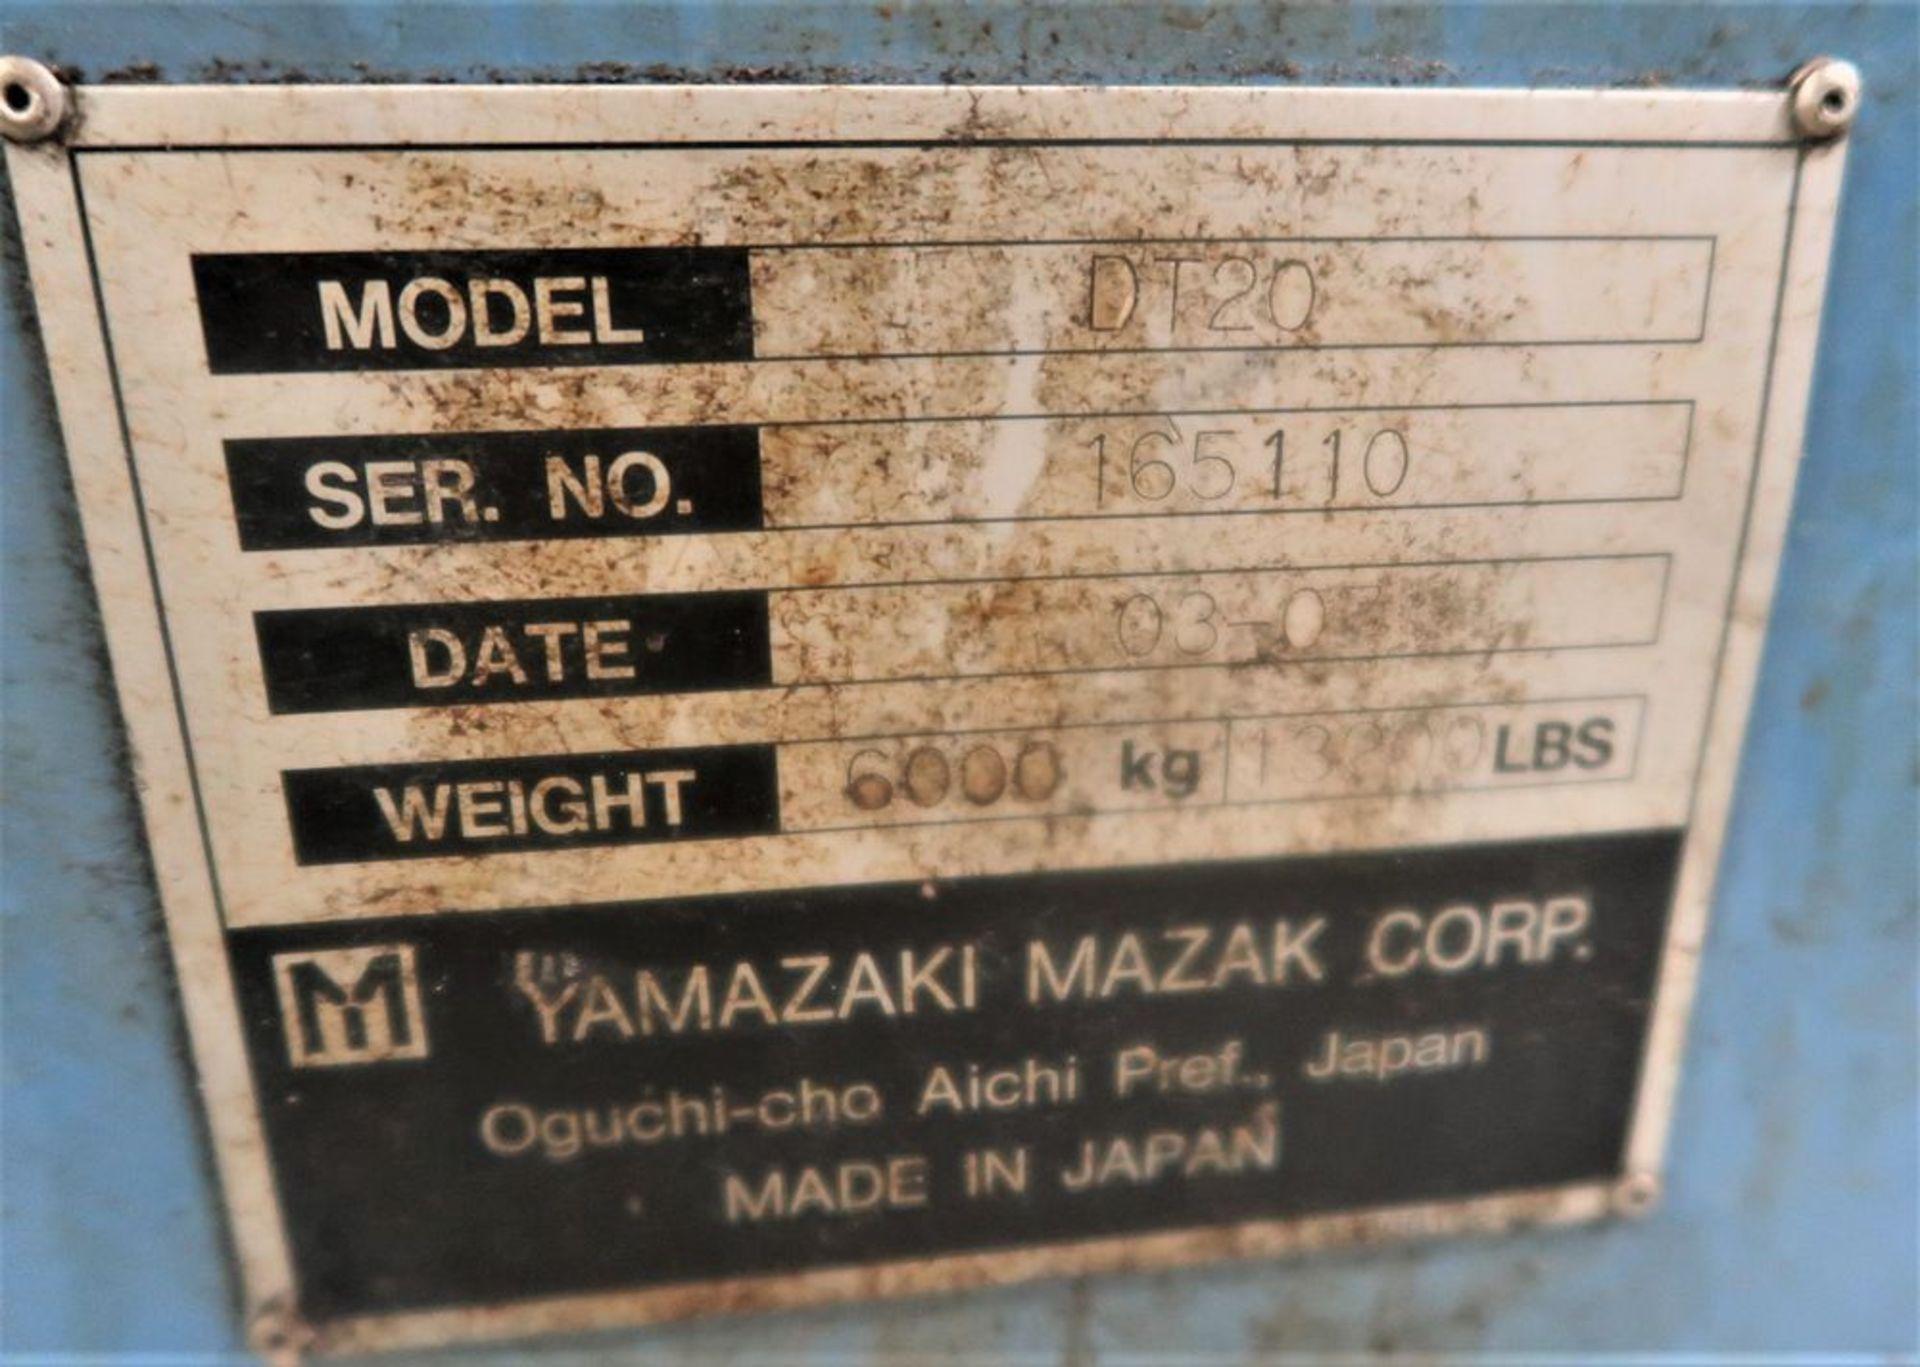 Lot 39 - Mazak Dual Turn 20 Twin Spindle CNC Turning Center Lathe, S/N 165110